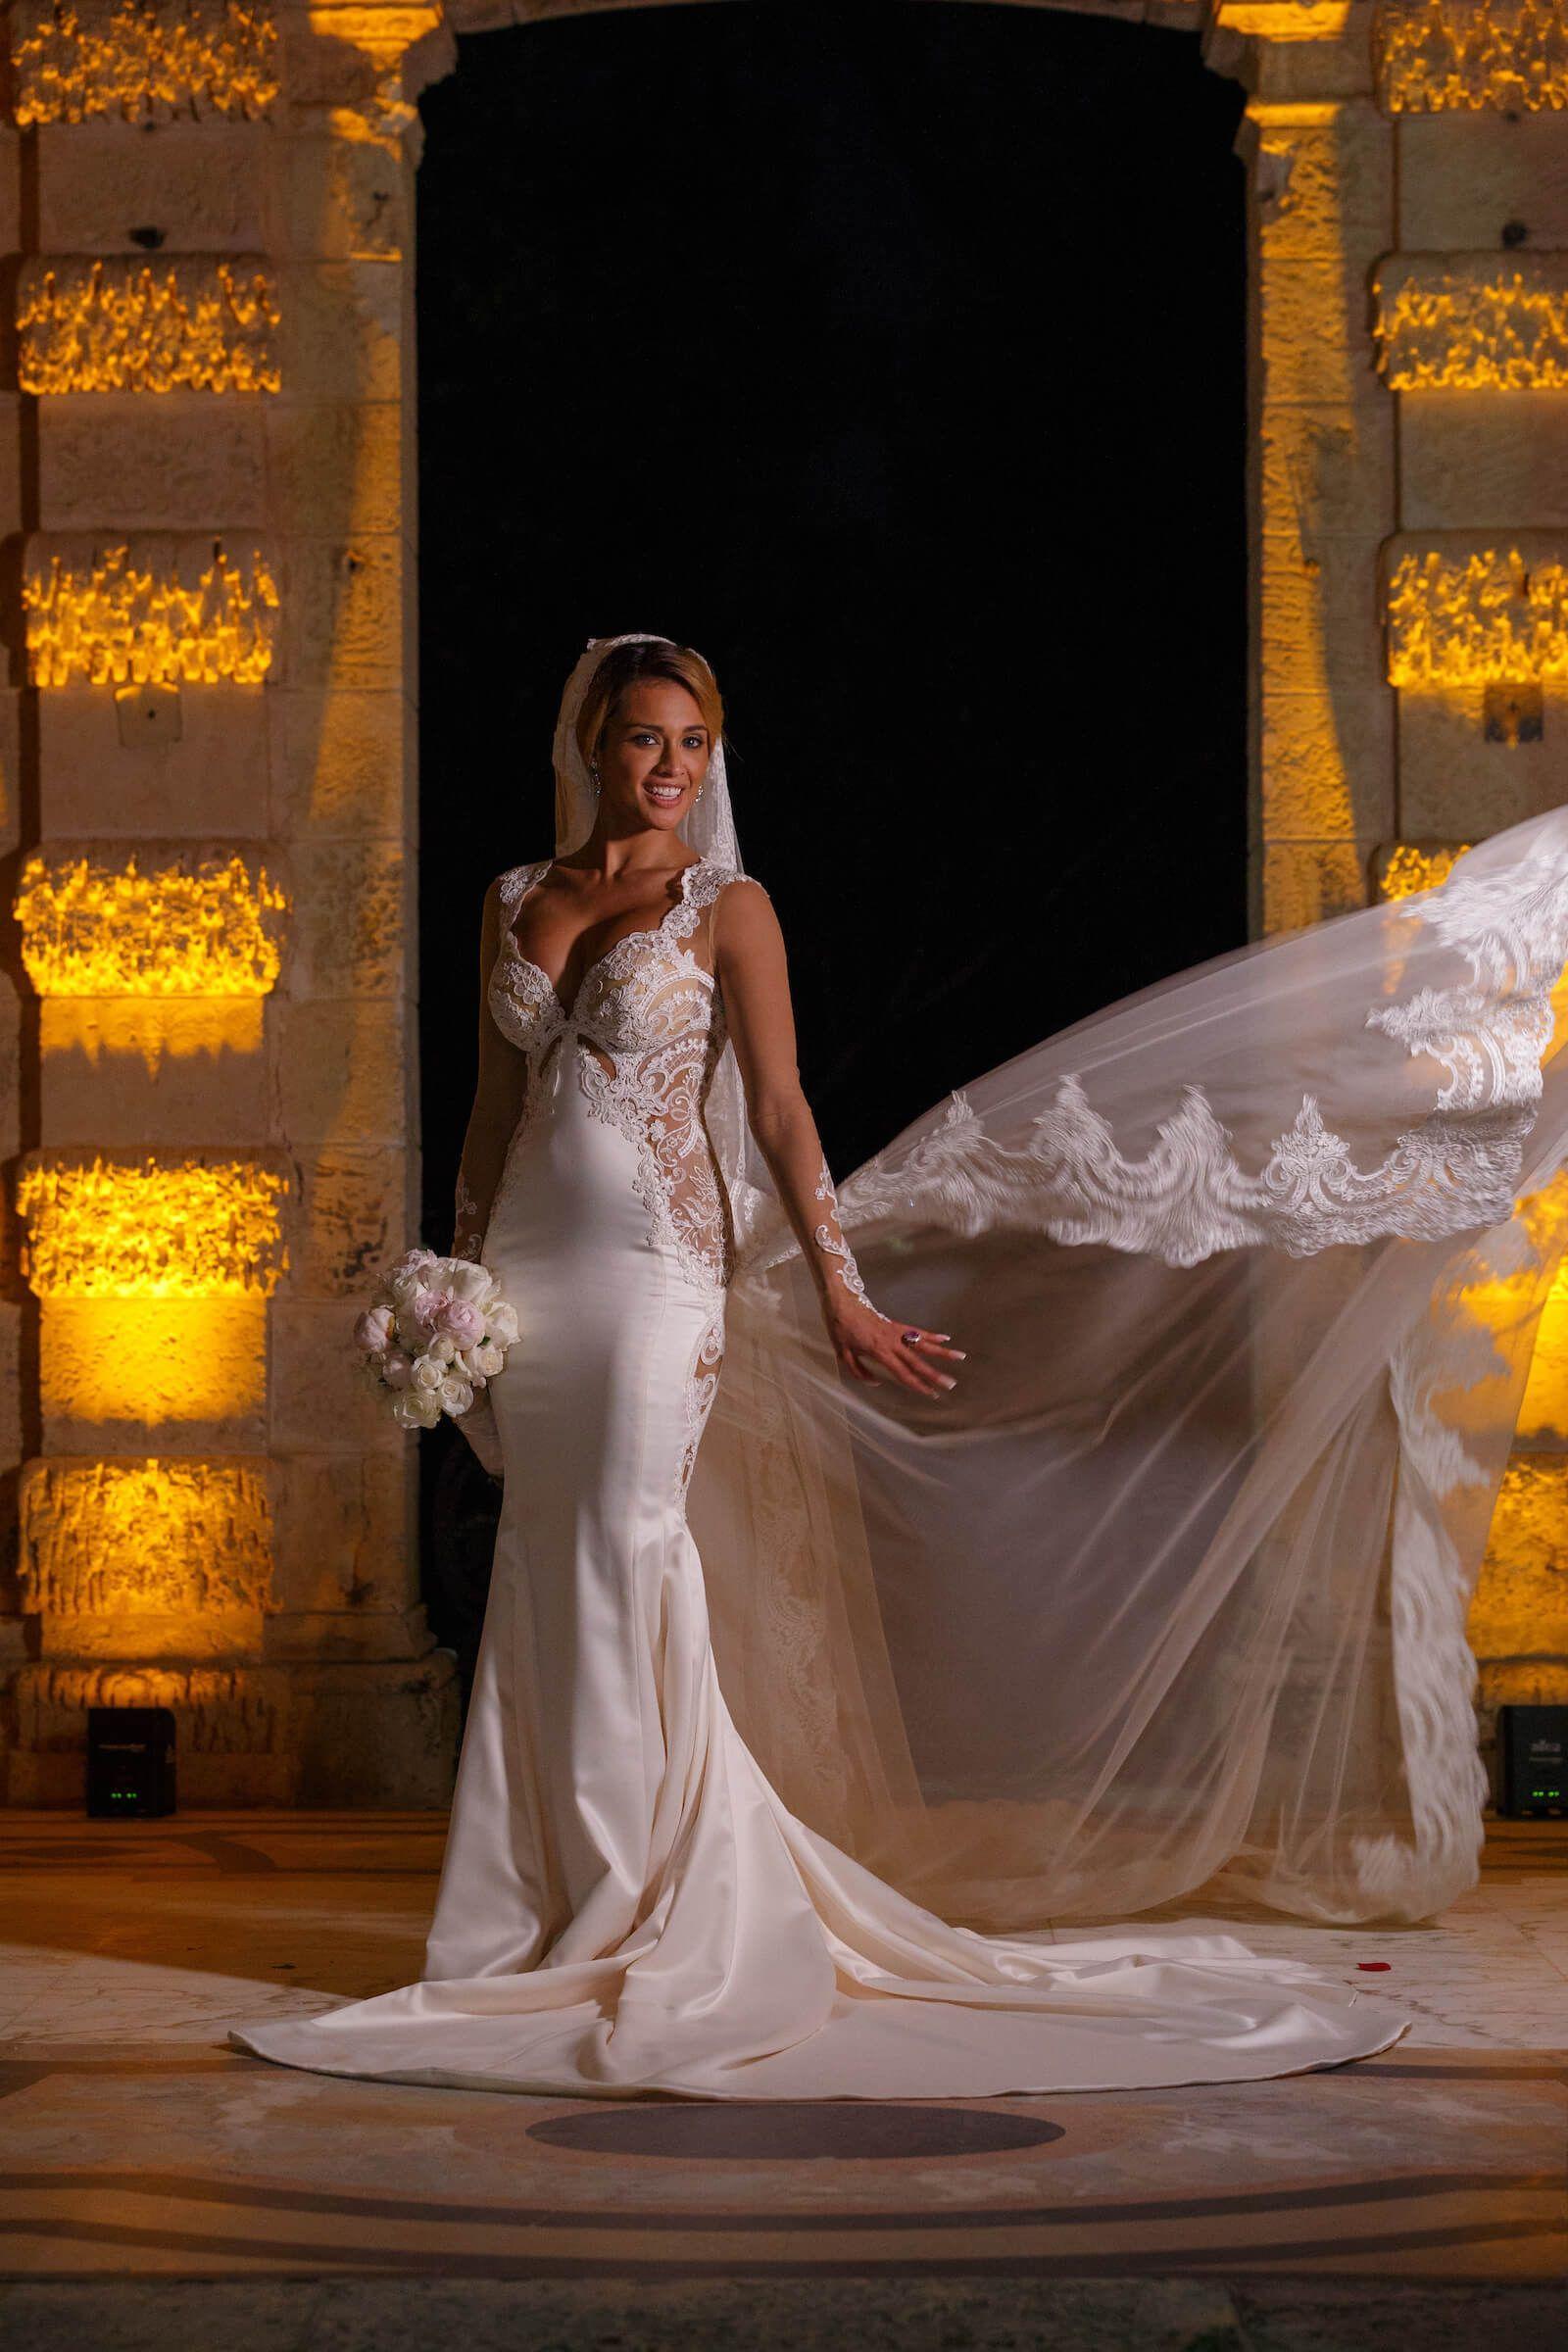 Bridal Portrait |Vizcaya Miami Wedding | Aram Event Photography | Vizcaya Bridal Portrait Poses |Bridal portrait Ideas #bridalportraitposes Bridal Portrait |Vizcaya Miami Wedding | Aram Event Photography | Vizcaya Bridal Portrait Poses |Bridal portrait Ideas #bridalportraitposes